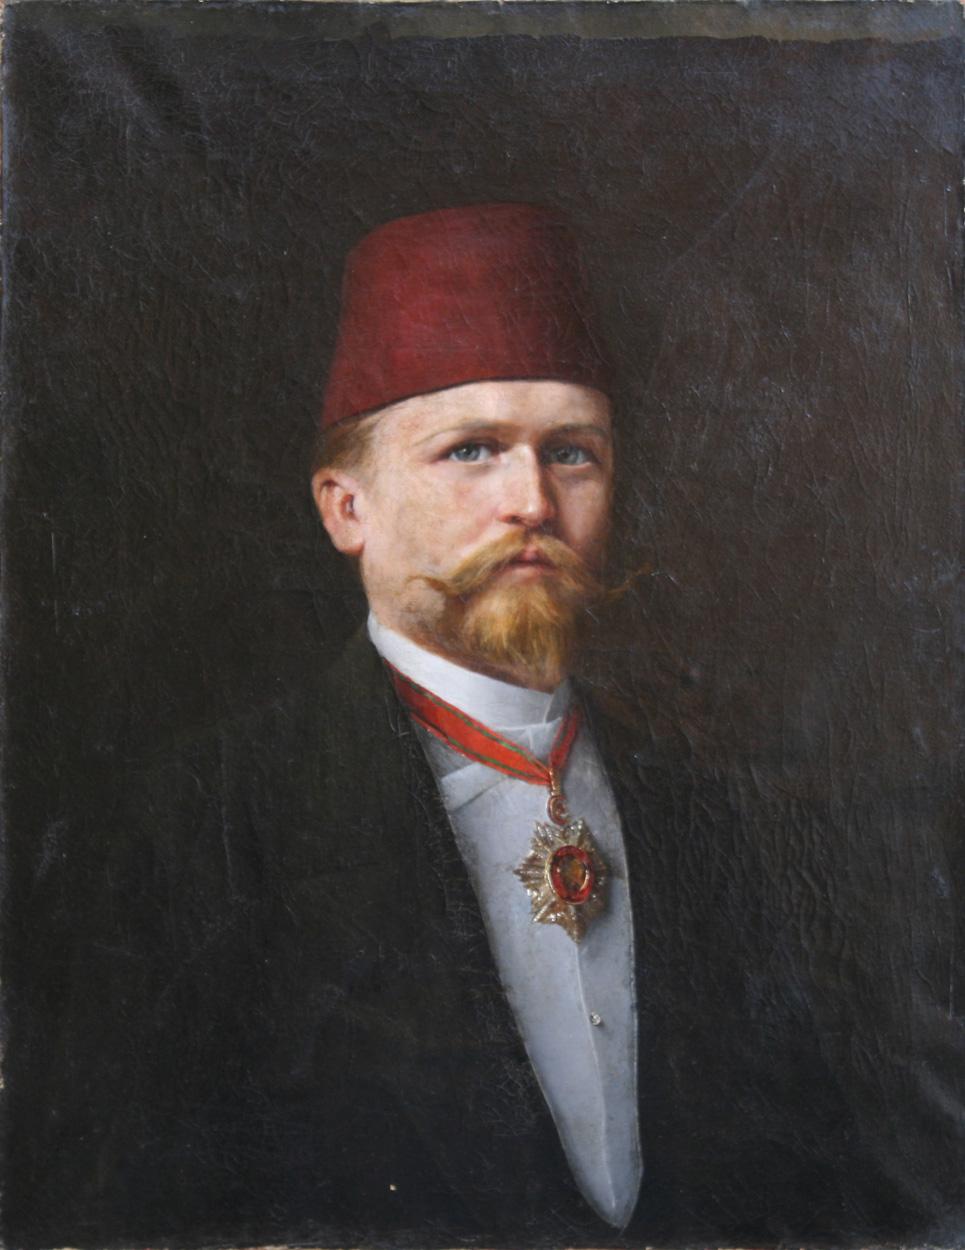 Osmane mit Mecidiye-Orden 3. Klasse